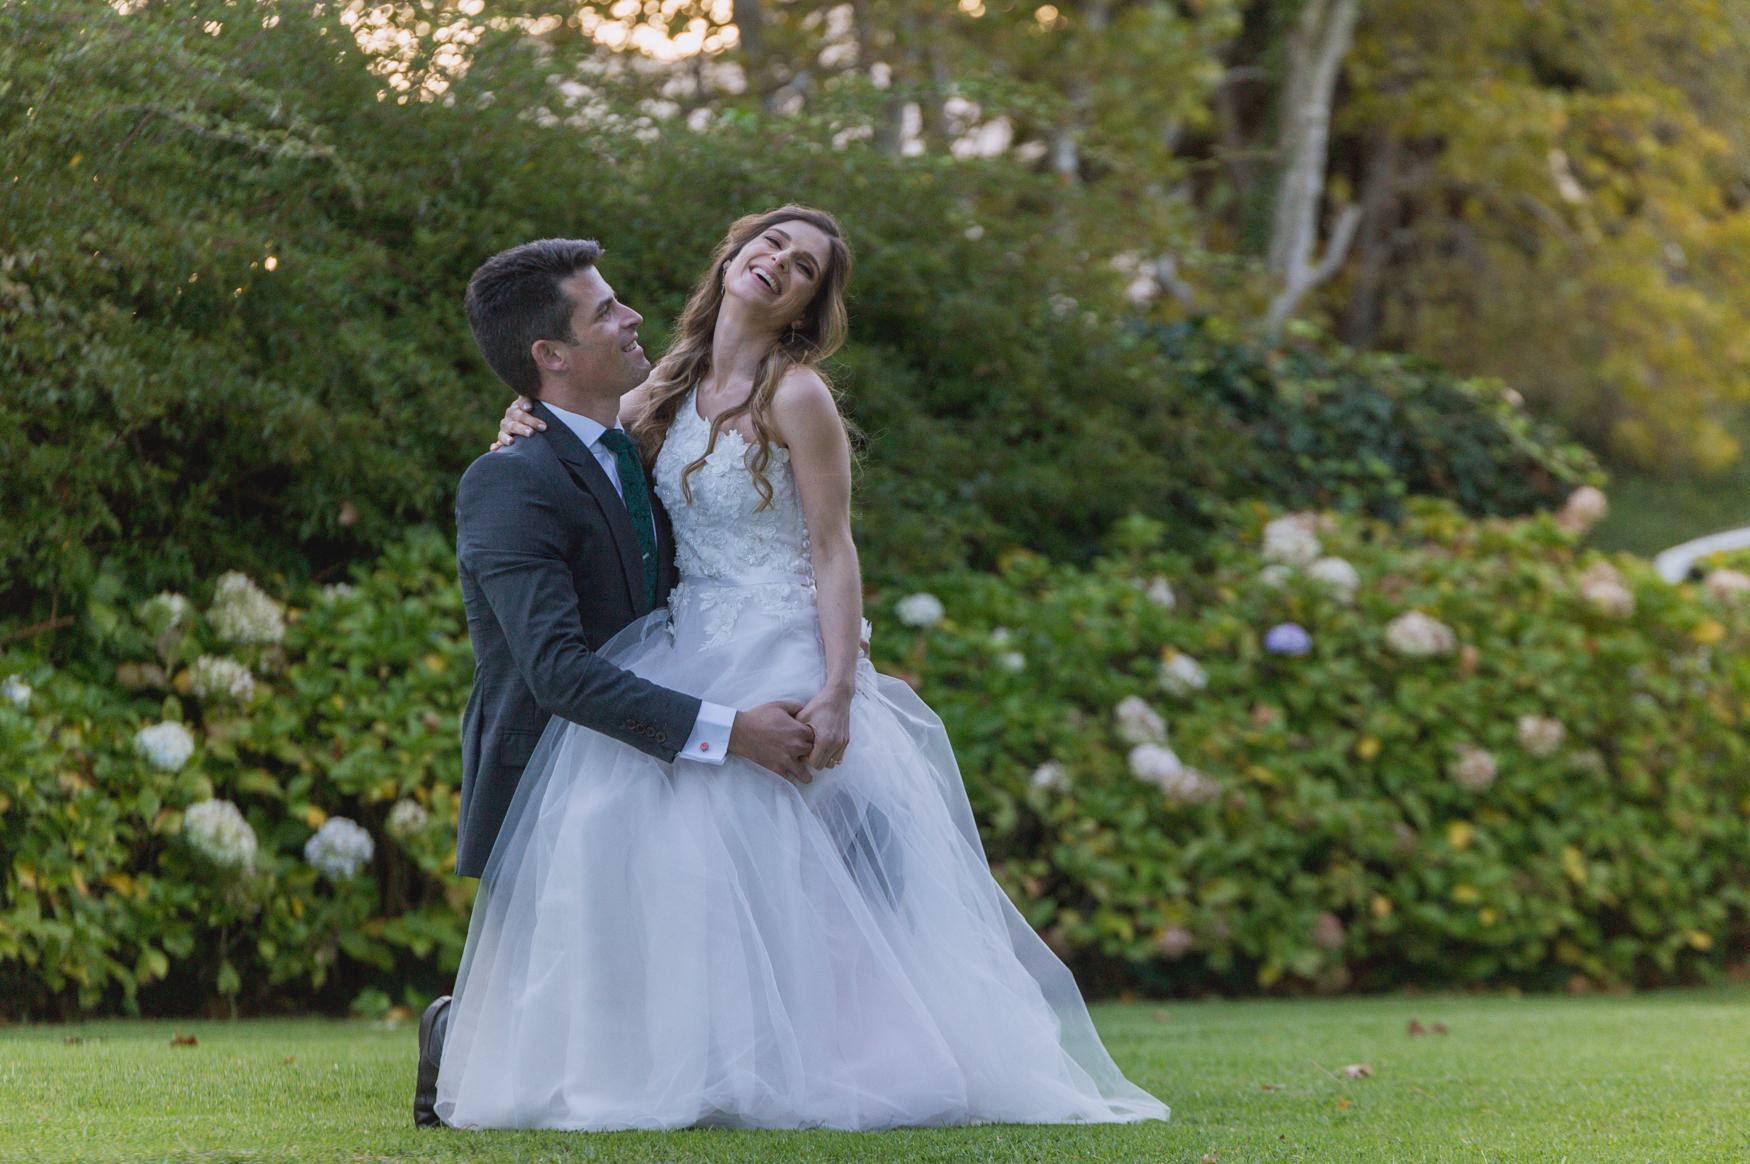 Leon_&_Martine's_Wedding_Photographs_17th_April_2019_@johnhenryweddingphoto_Low_Resolution_Web-420.JPG